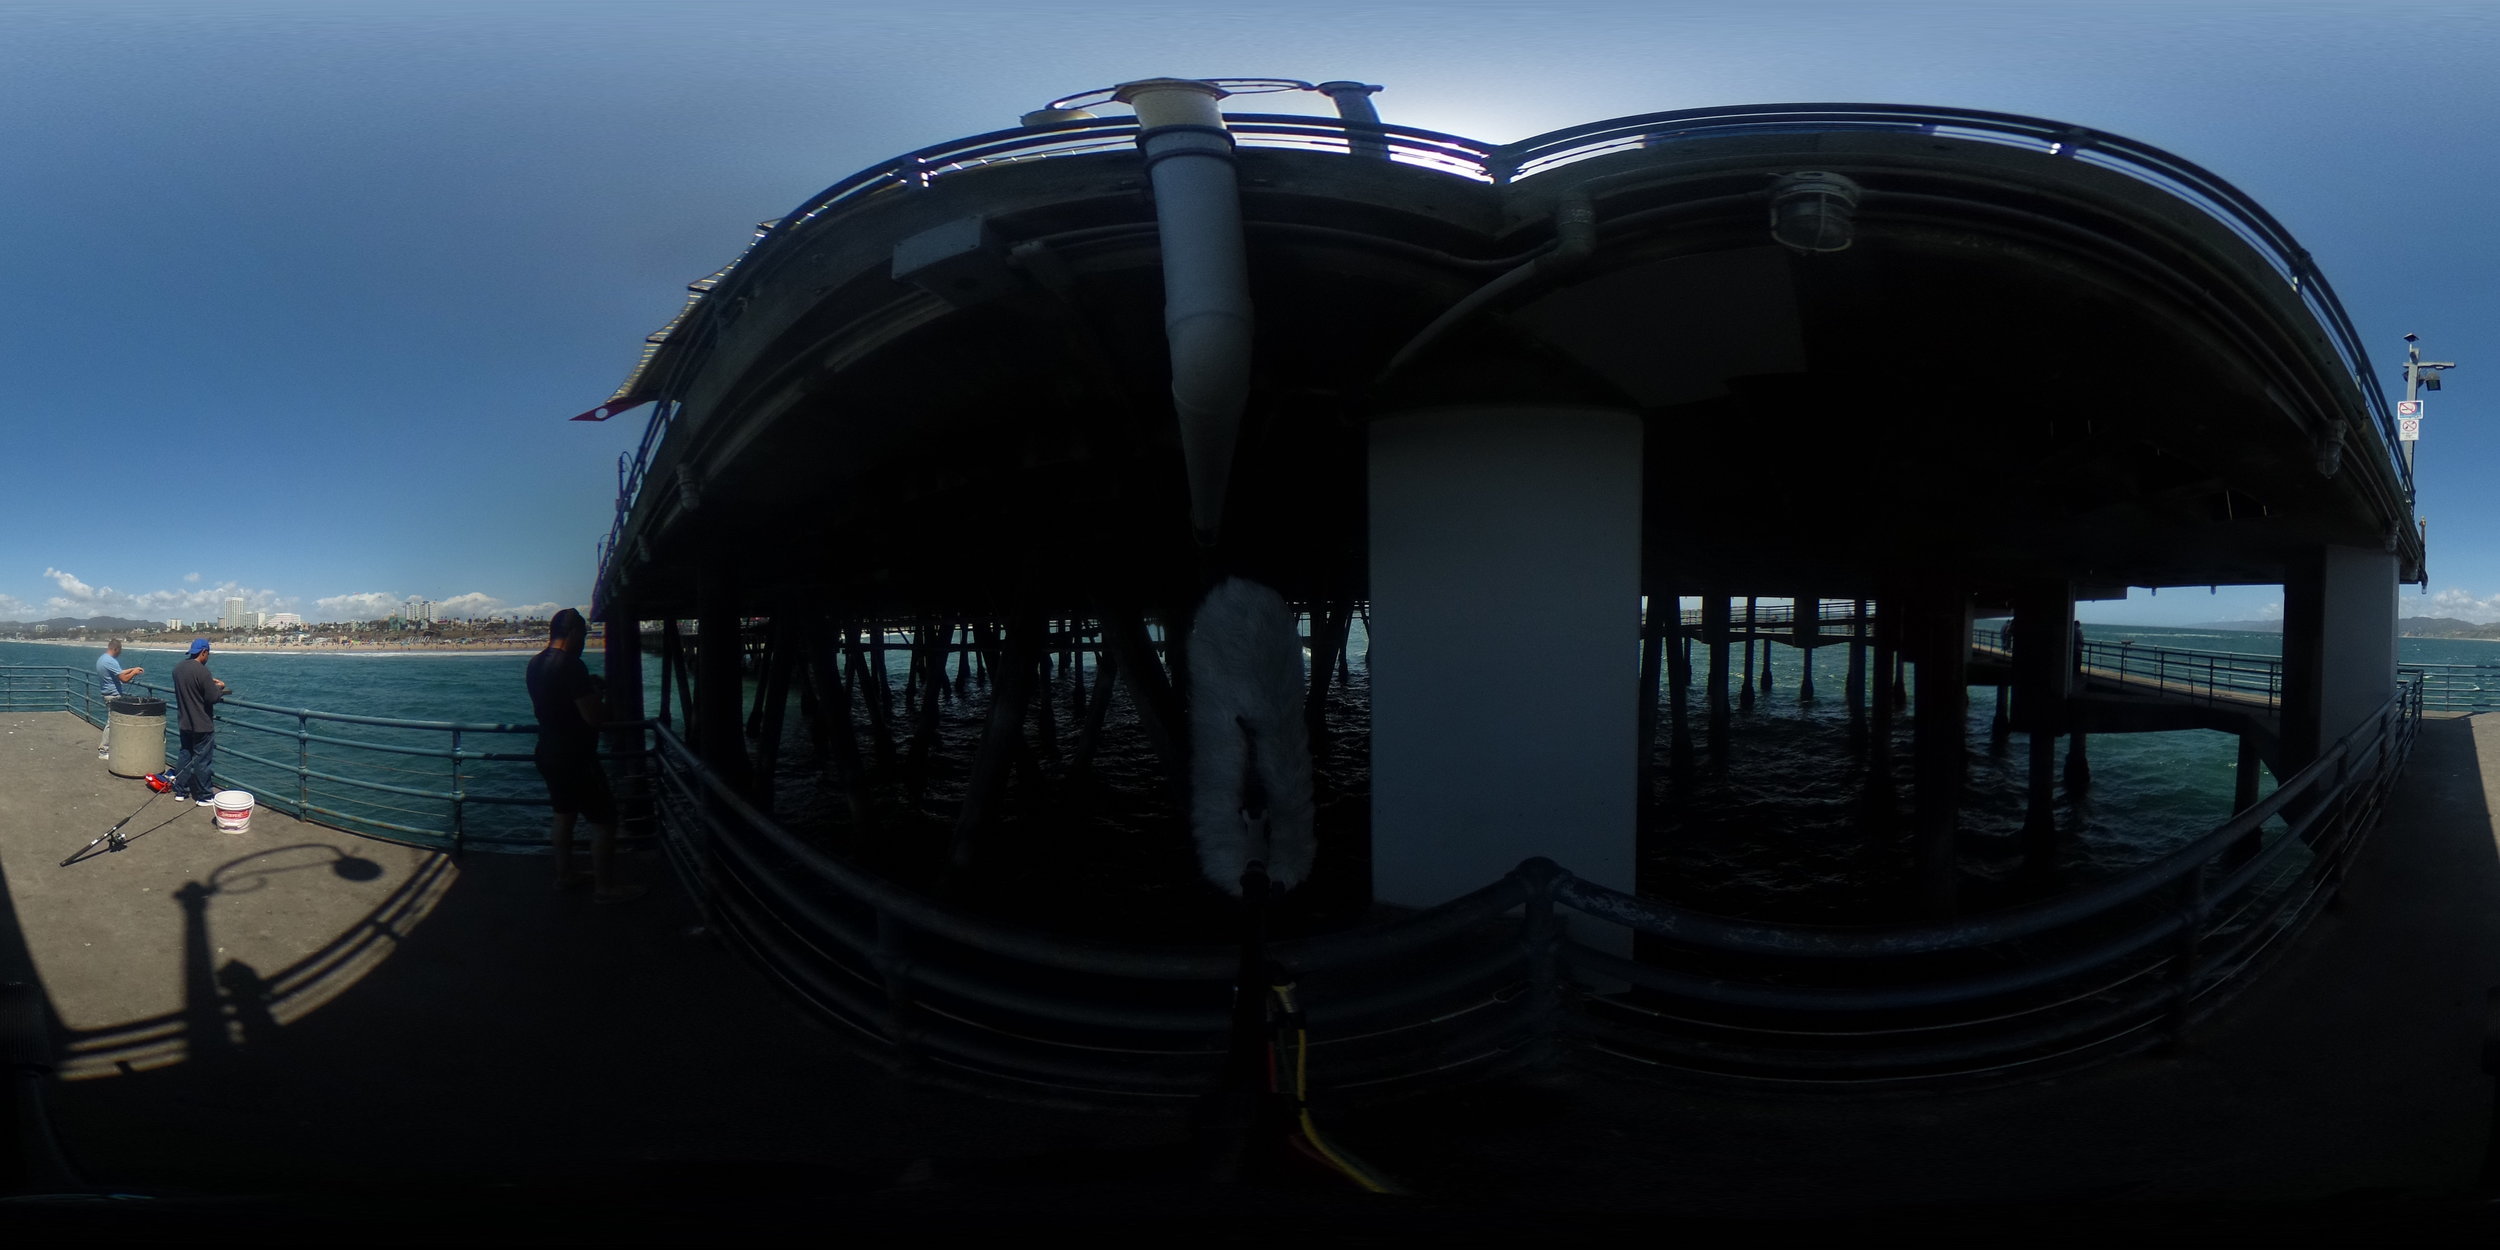 EXT_Day_Beach_FishingPier_SteadyLappingWaterBelow_LightWind_SporadicFishermanVoices_JPEG.JPG